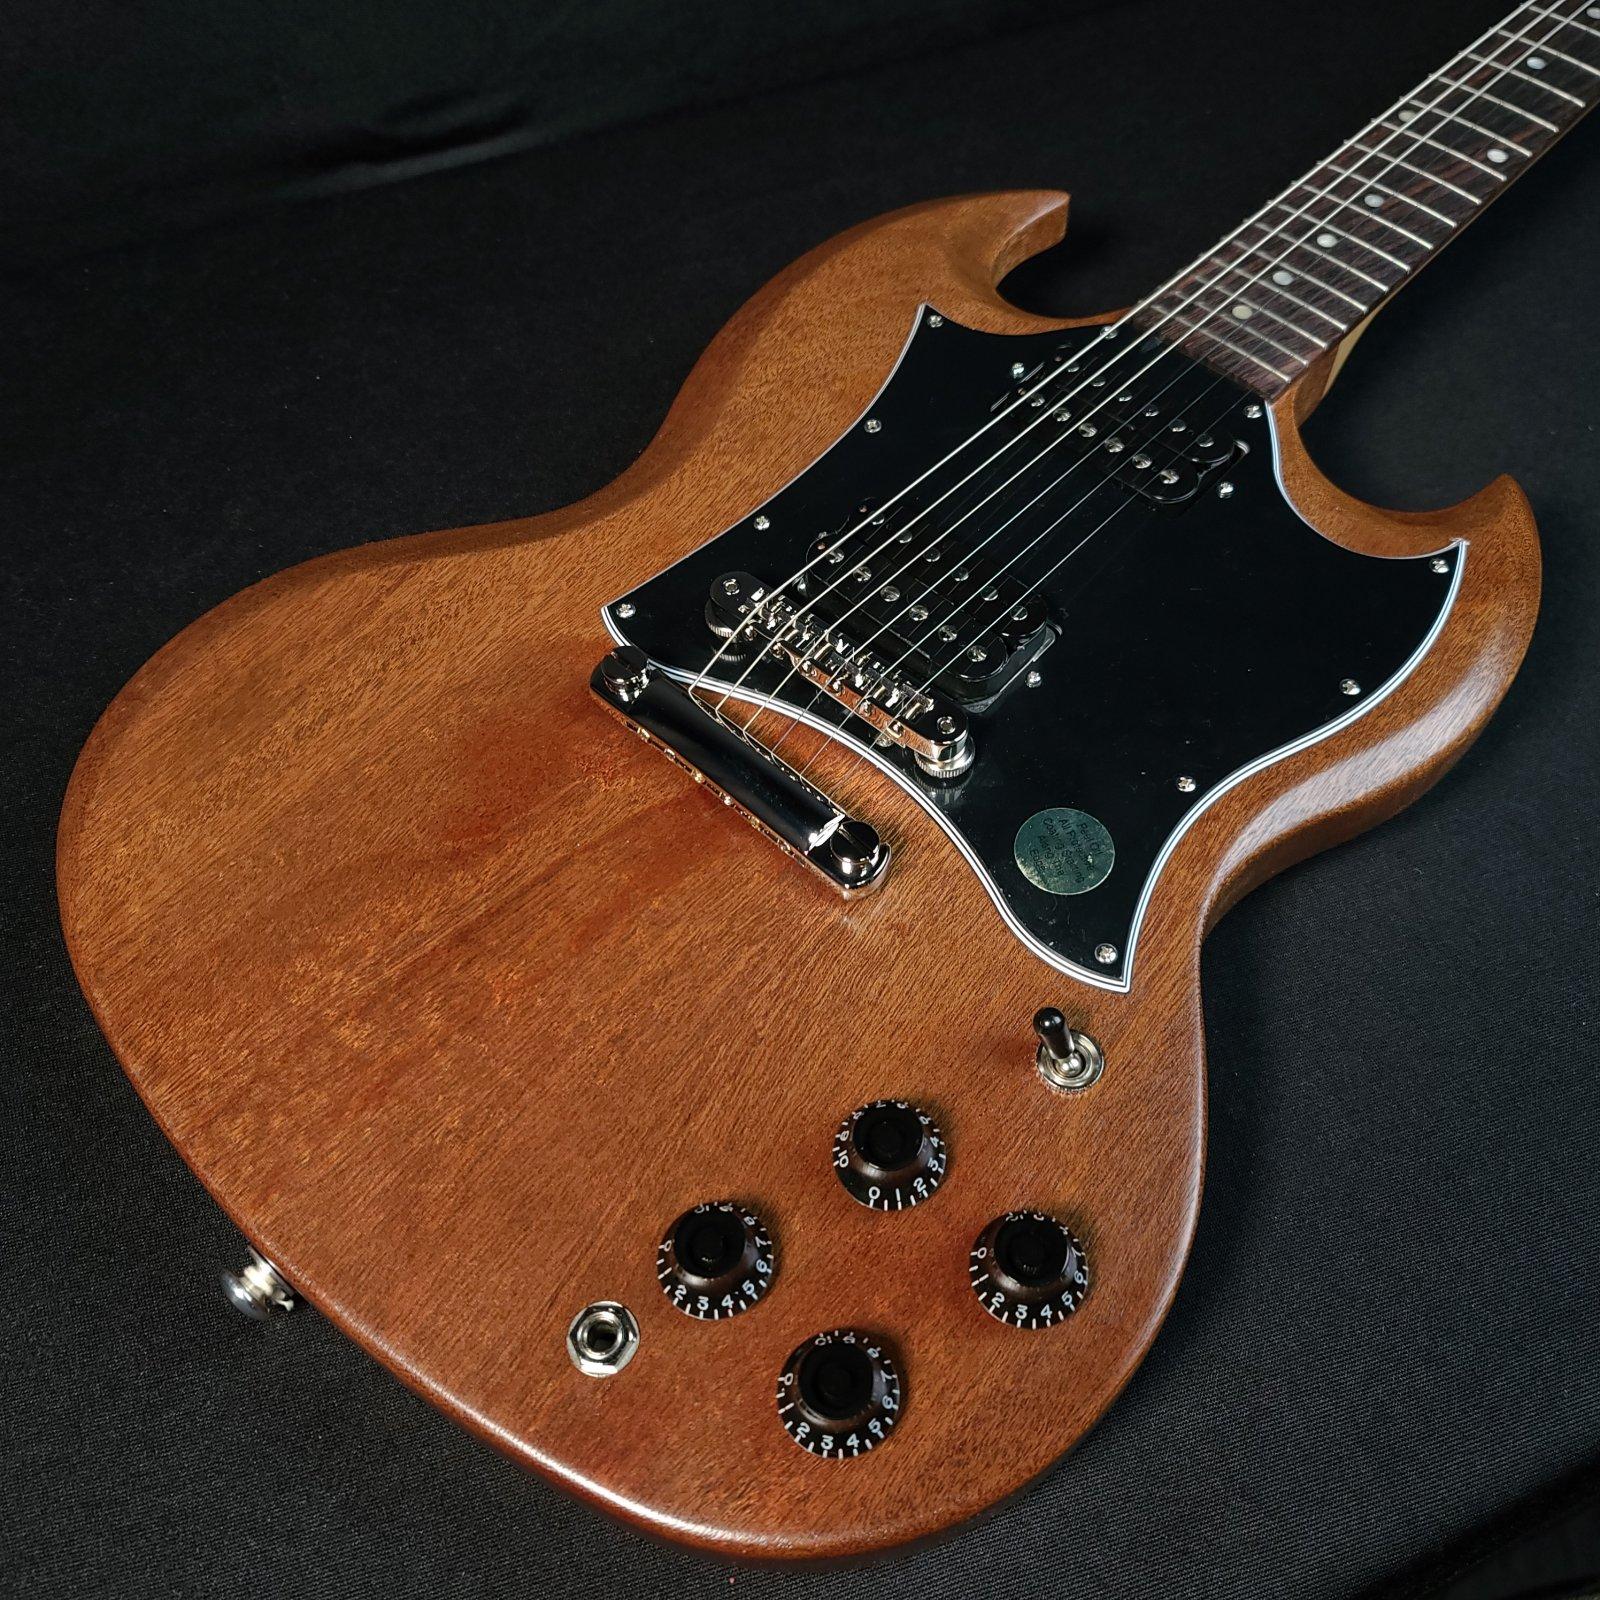 Gibson SG Tribute Satin Walnut Vintage w/Soft Case